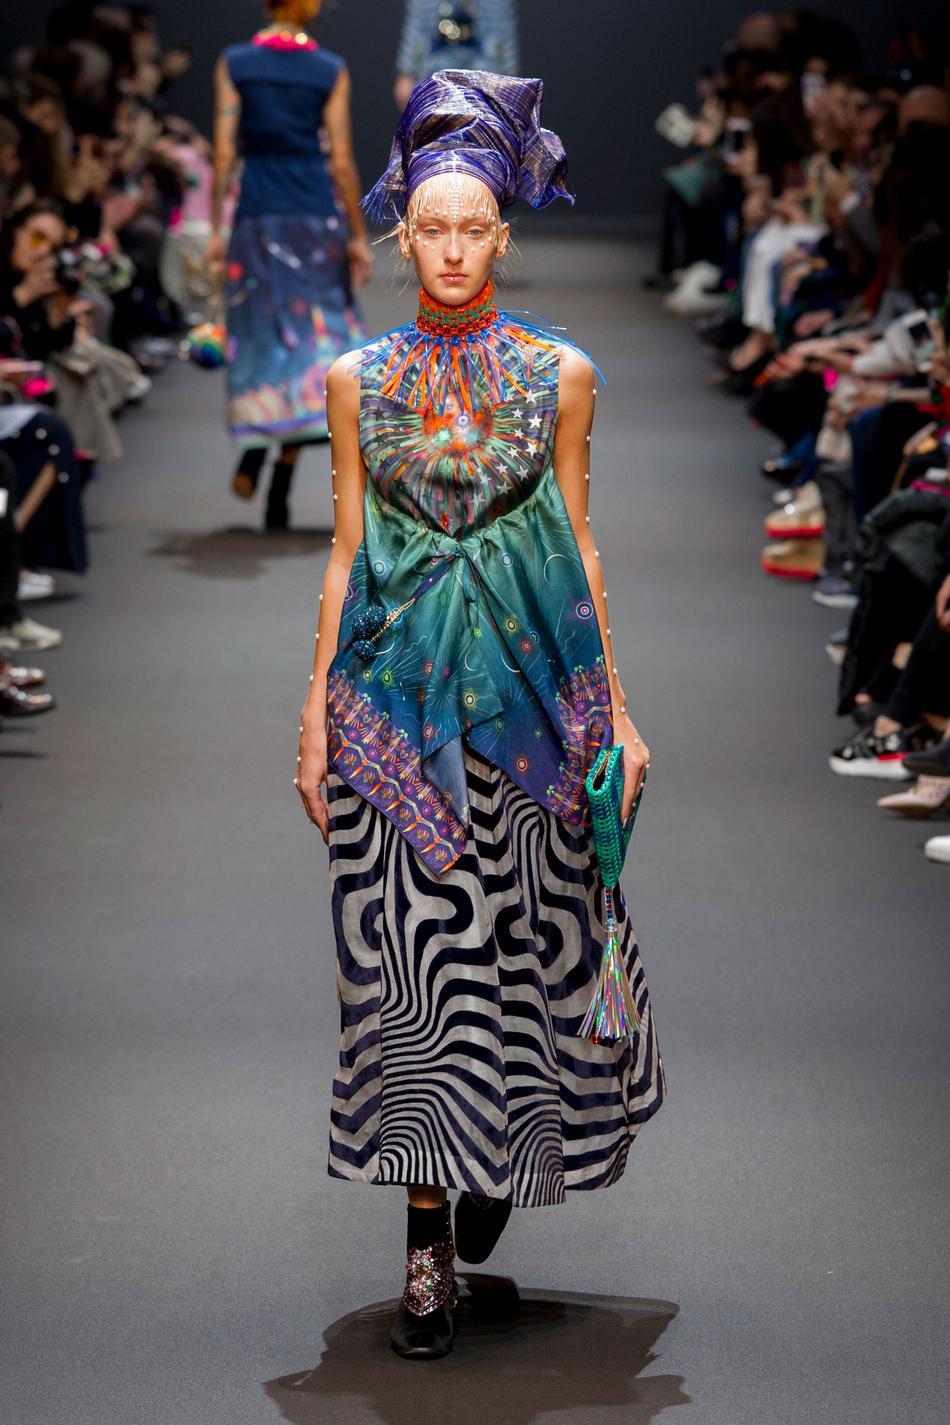 Défilé Manish Arora Fashion Week 2017 - Look 4